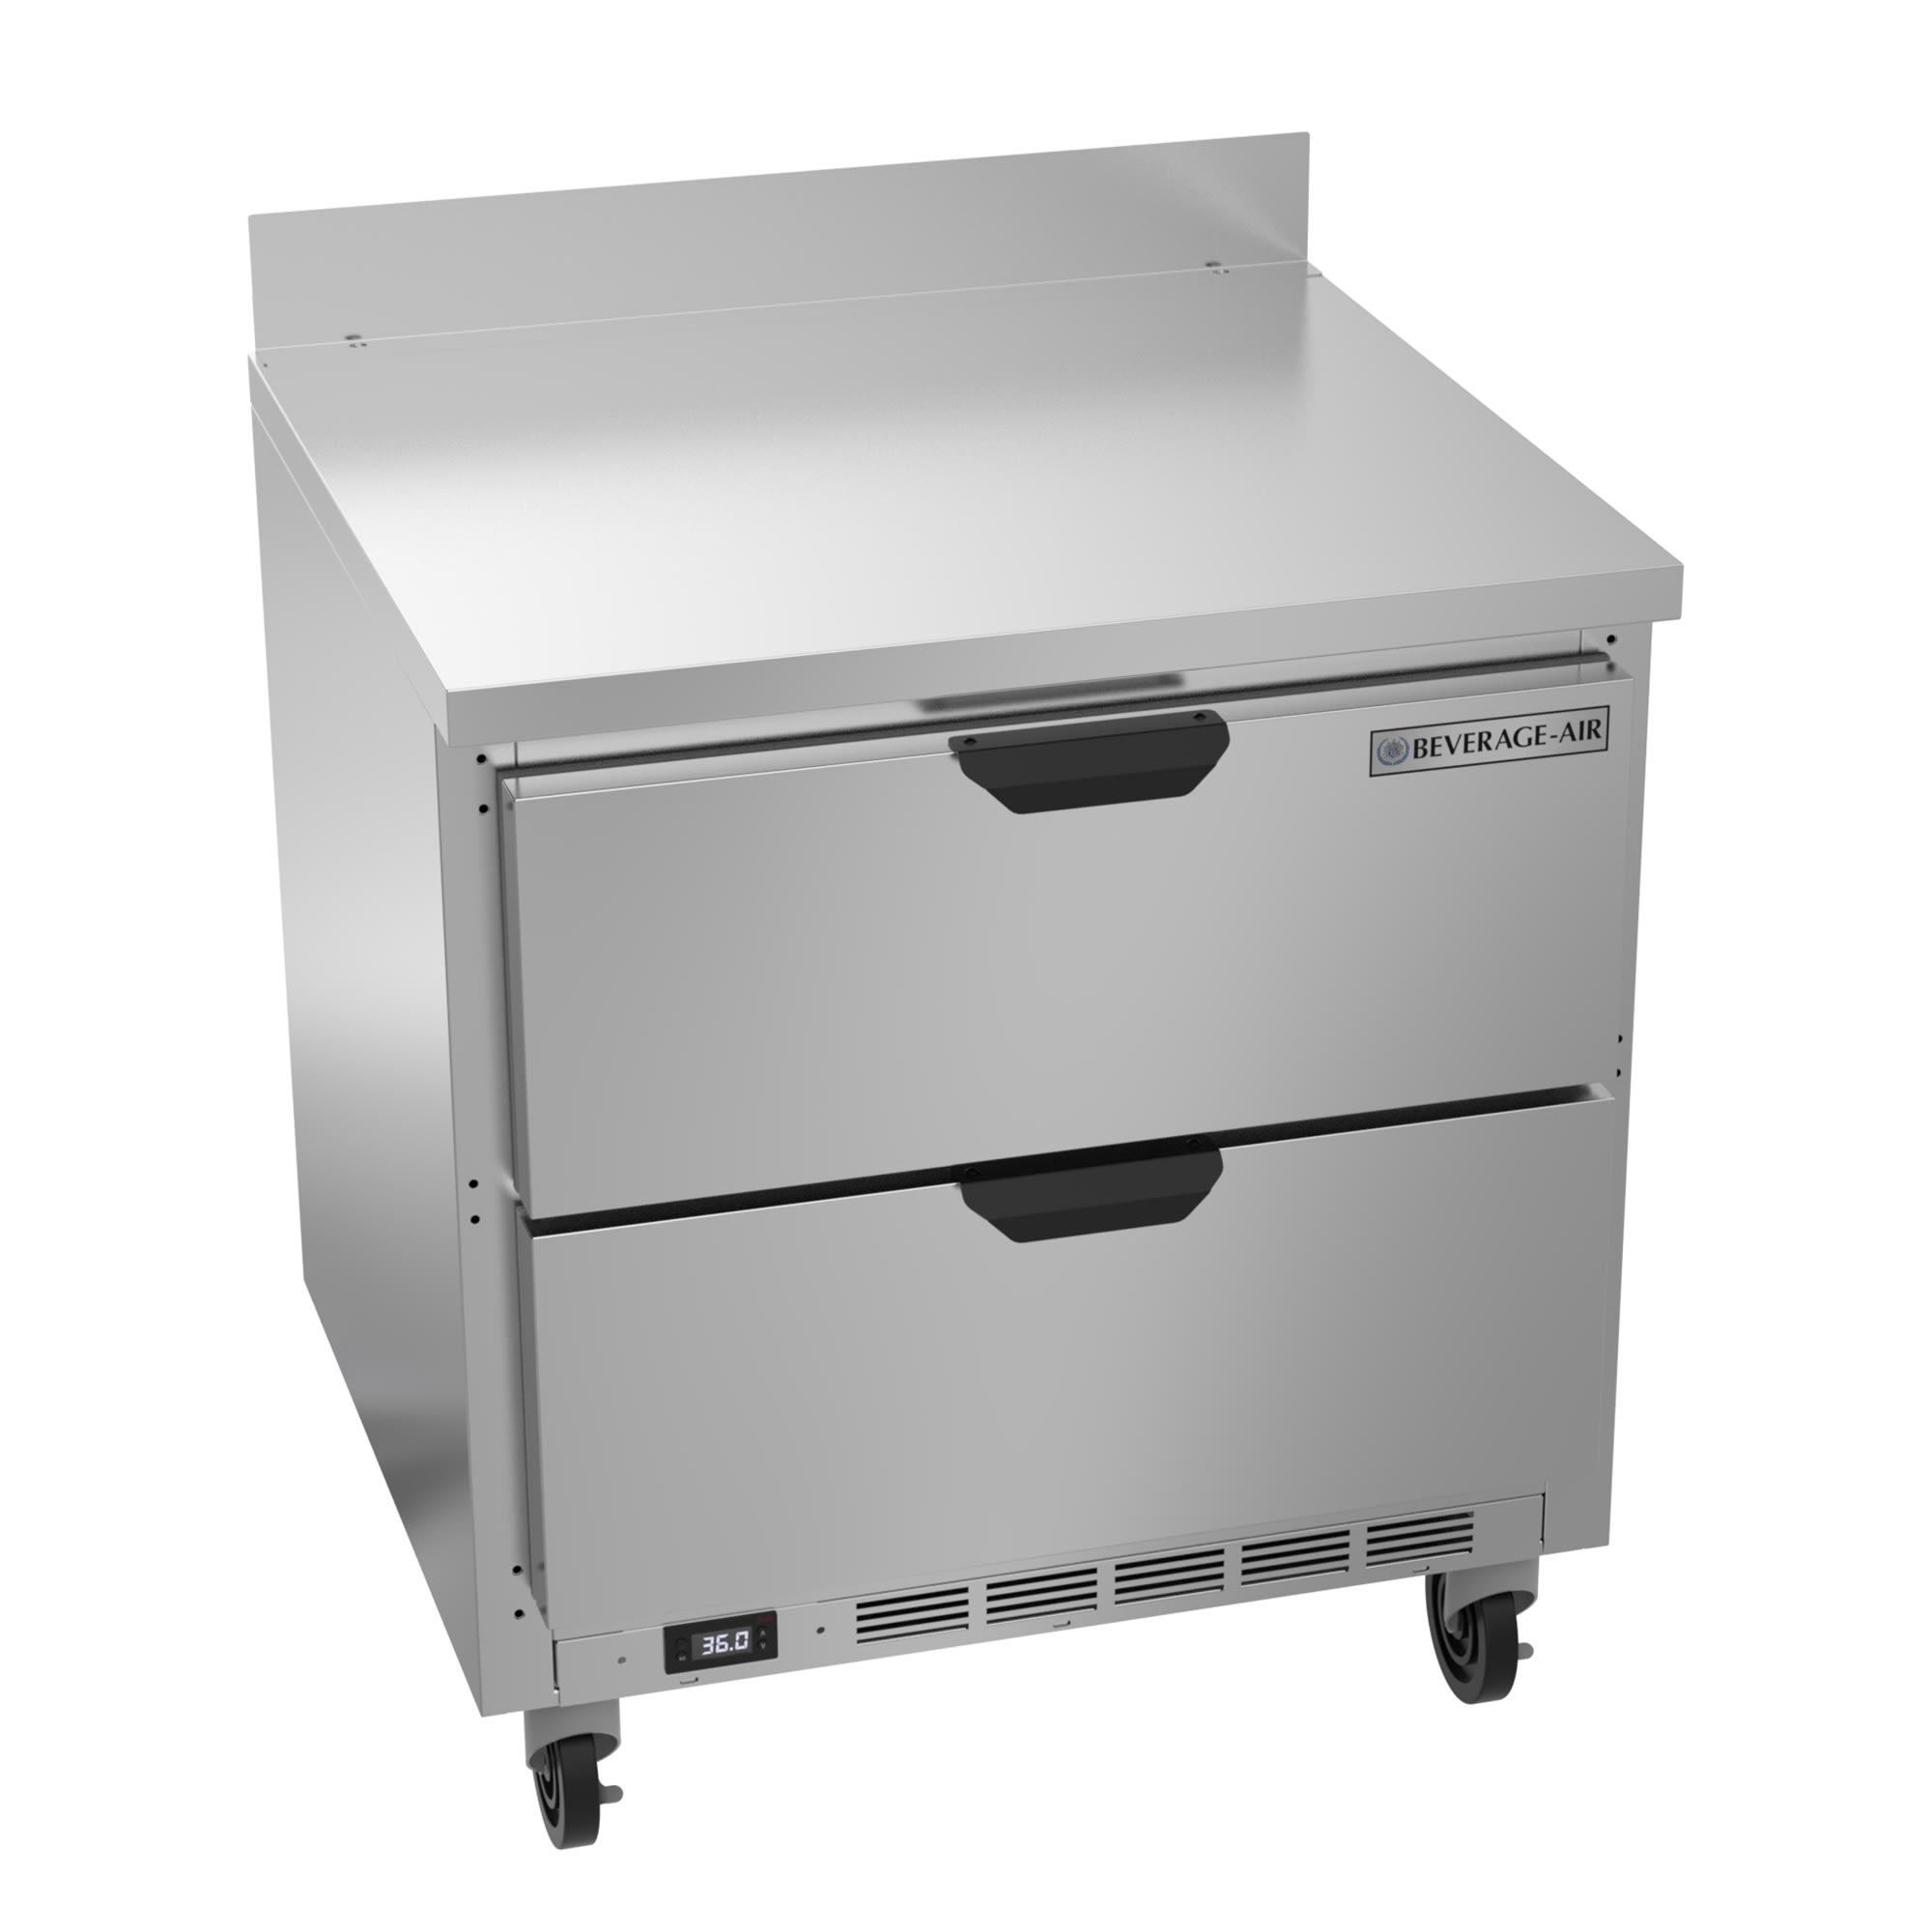 "Beverage Air SPED27HC-B 27"" Sandwich/Salad Prep Table w/ Refrigerated Base, 115v"